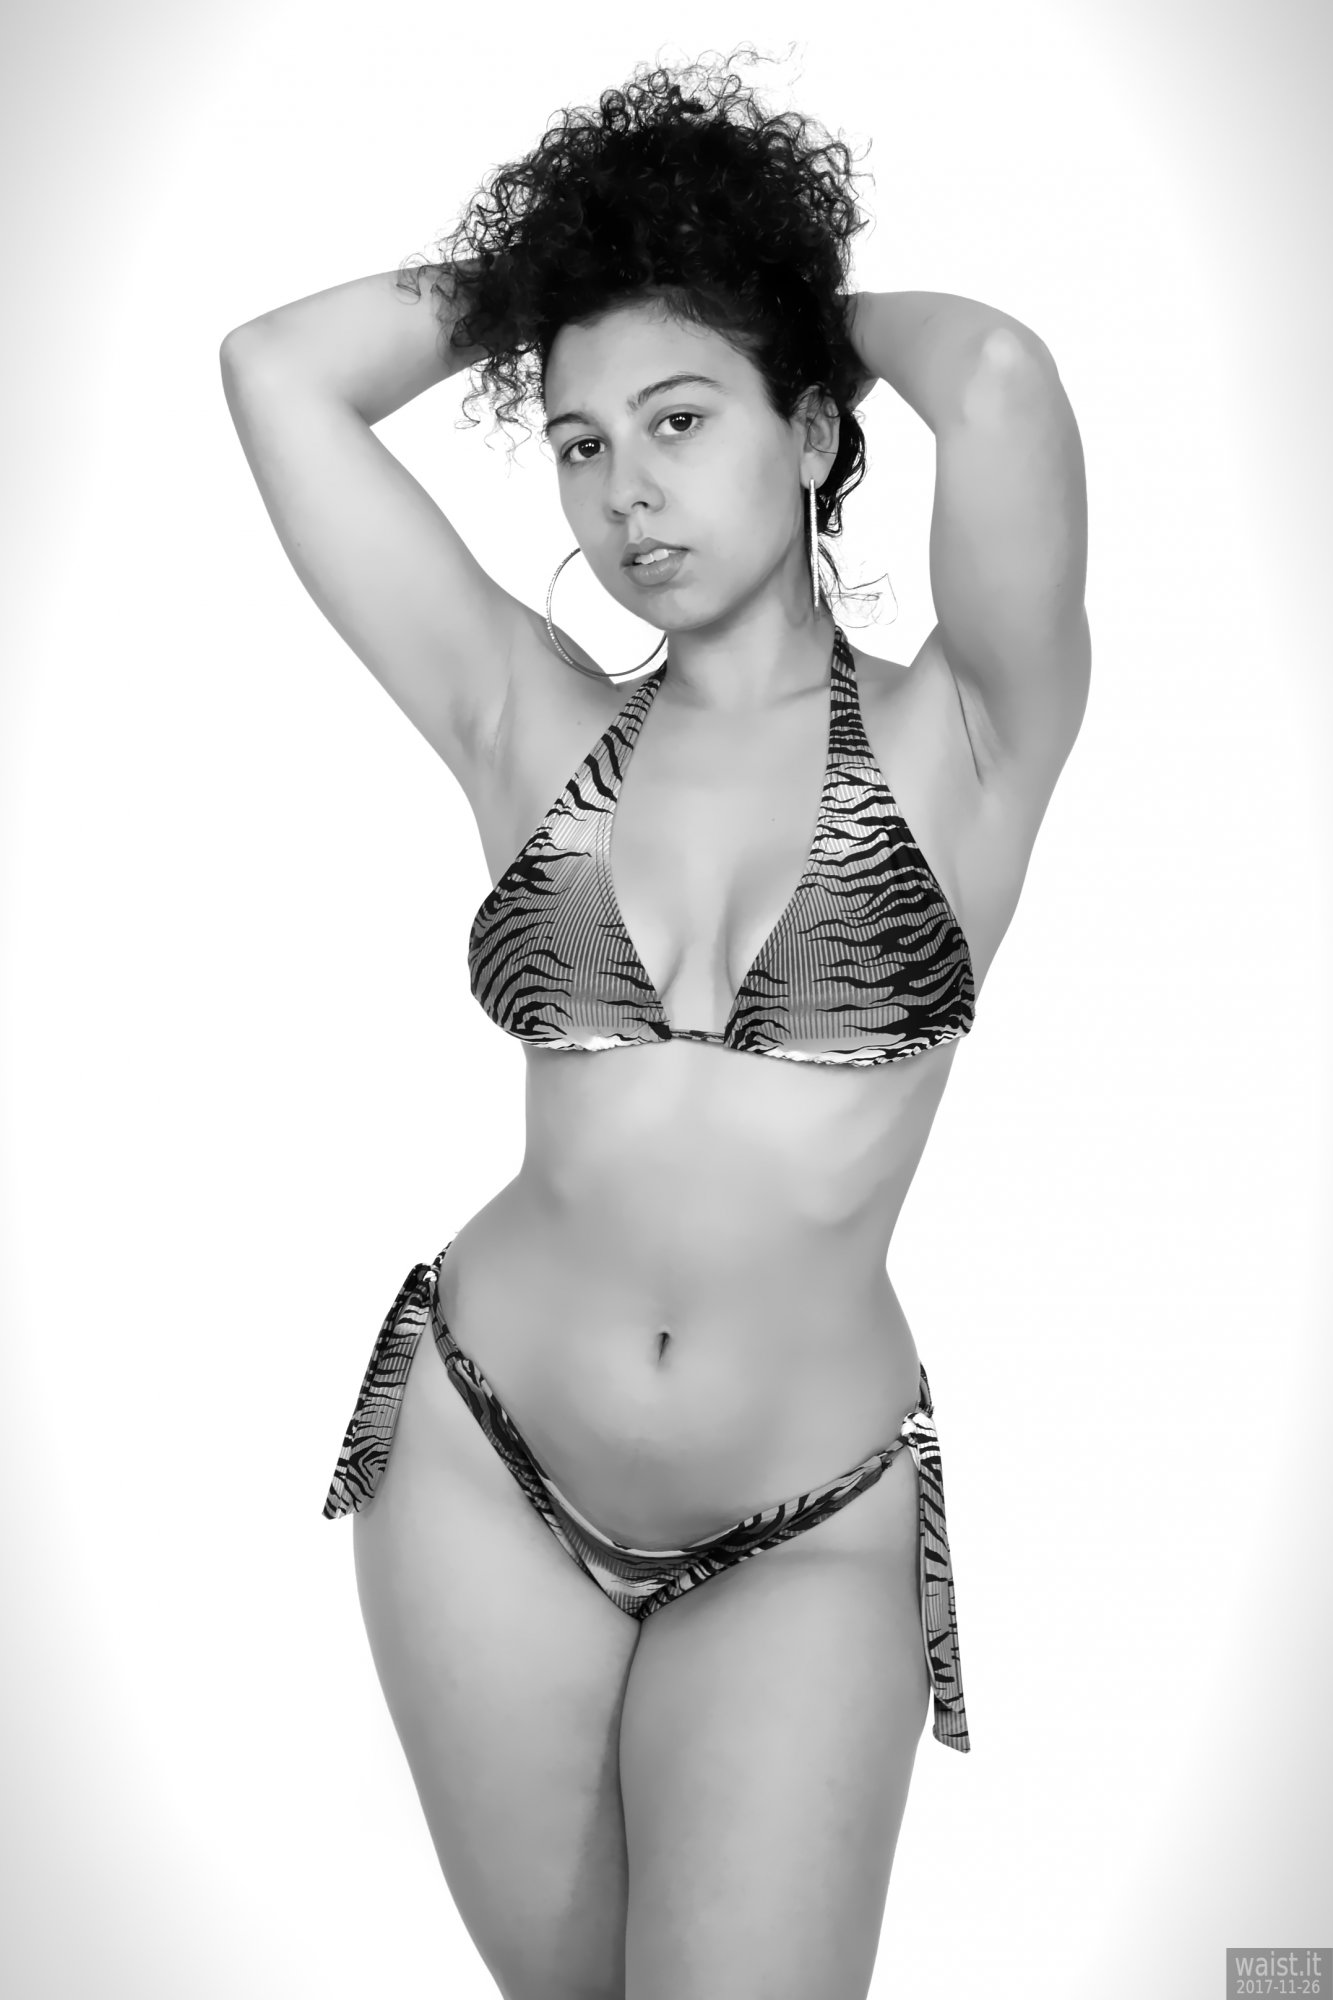 2017-11-26 Stephy Samer fashion shoot - in her own tie-side bikini